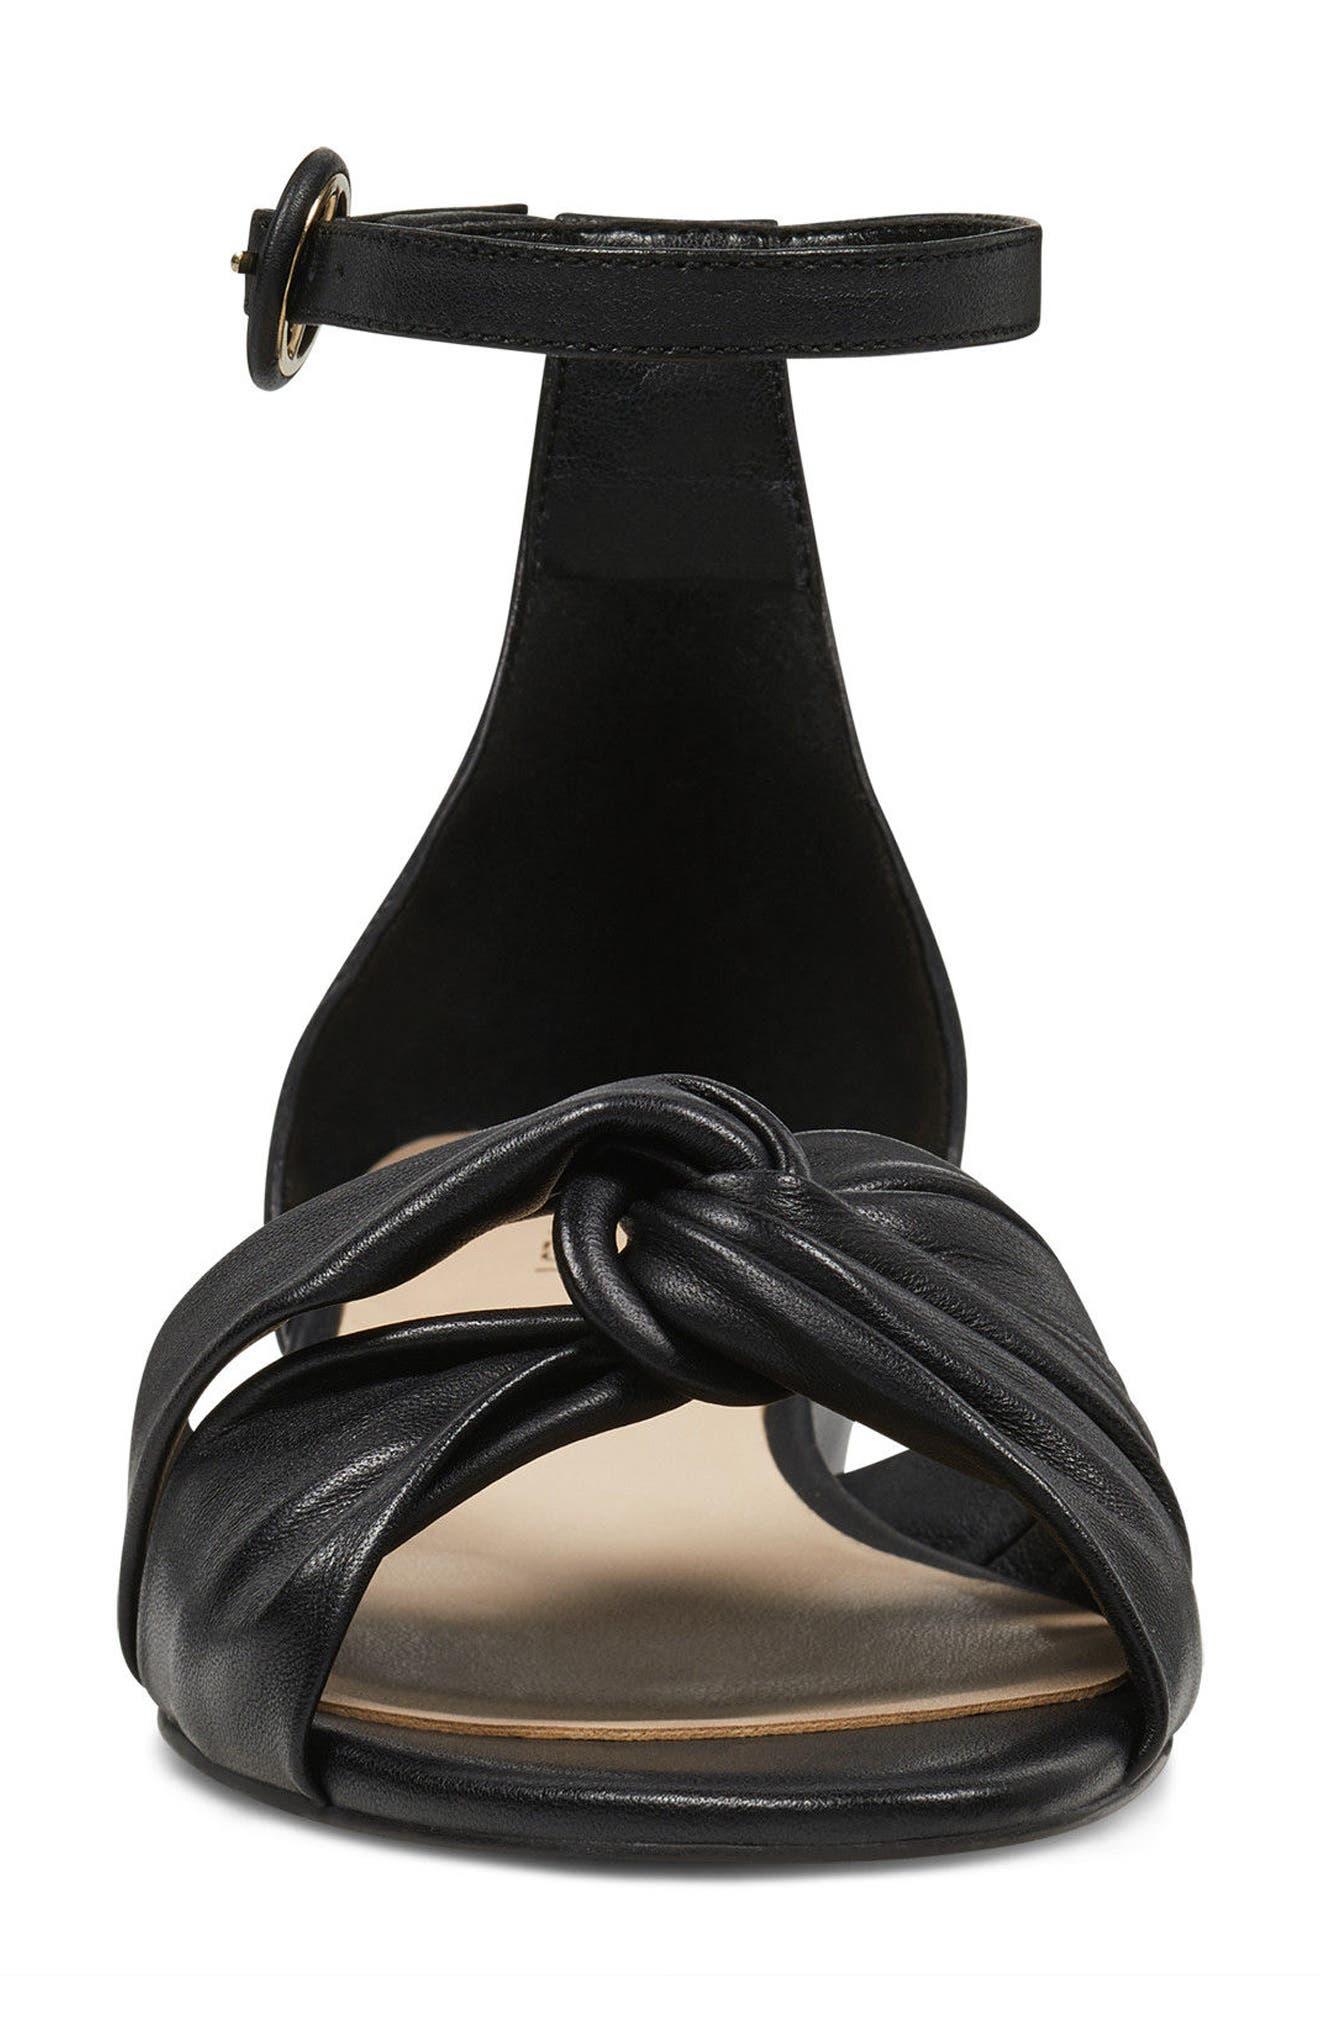 Lumsi Ankle Strap Sandal,                             Alternate thumbnail 4, color,                             Black Leather